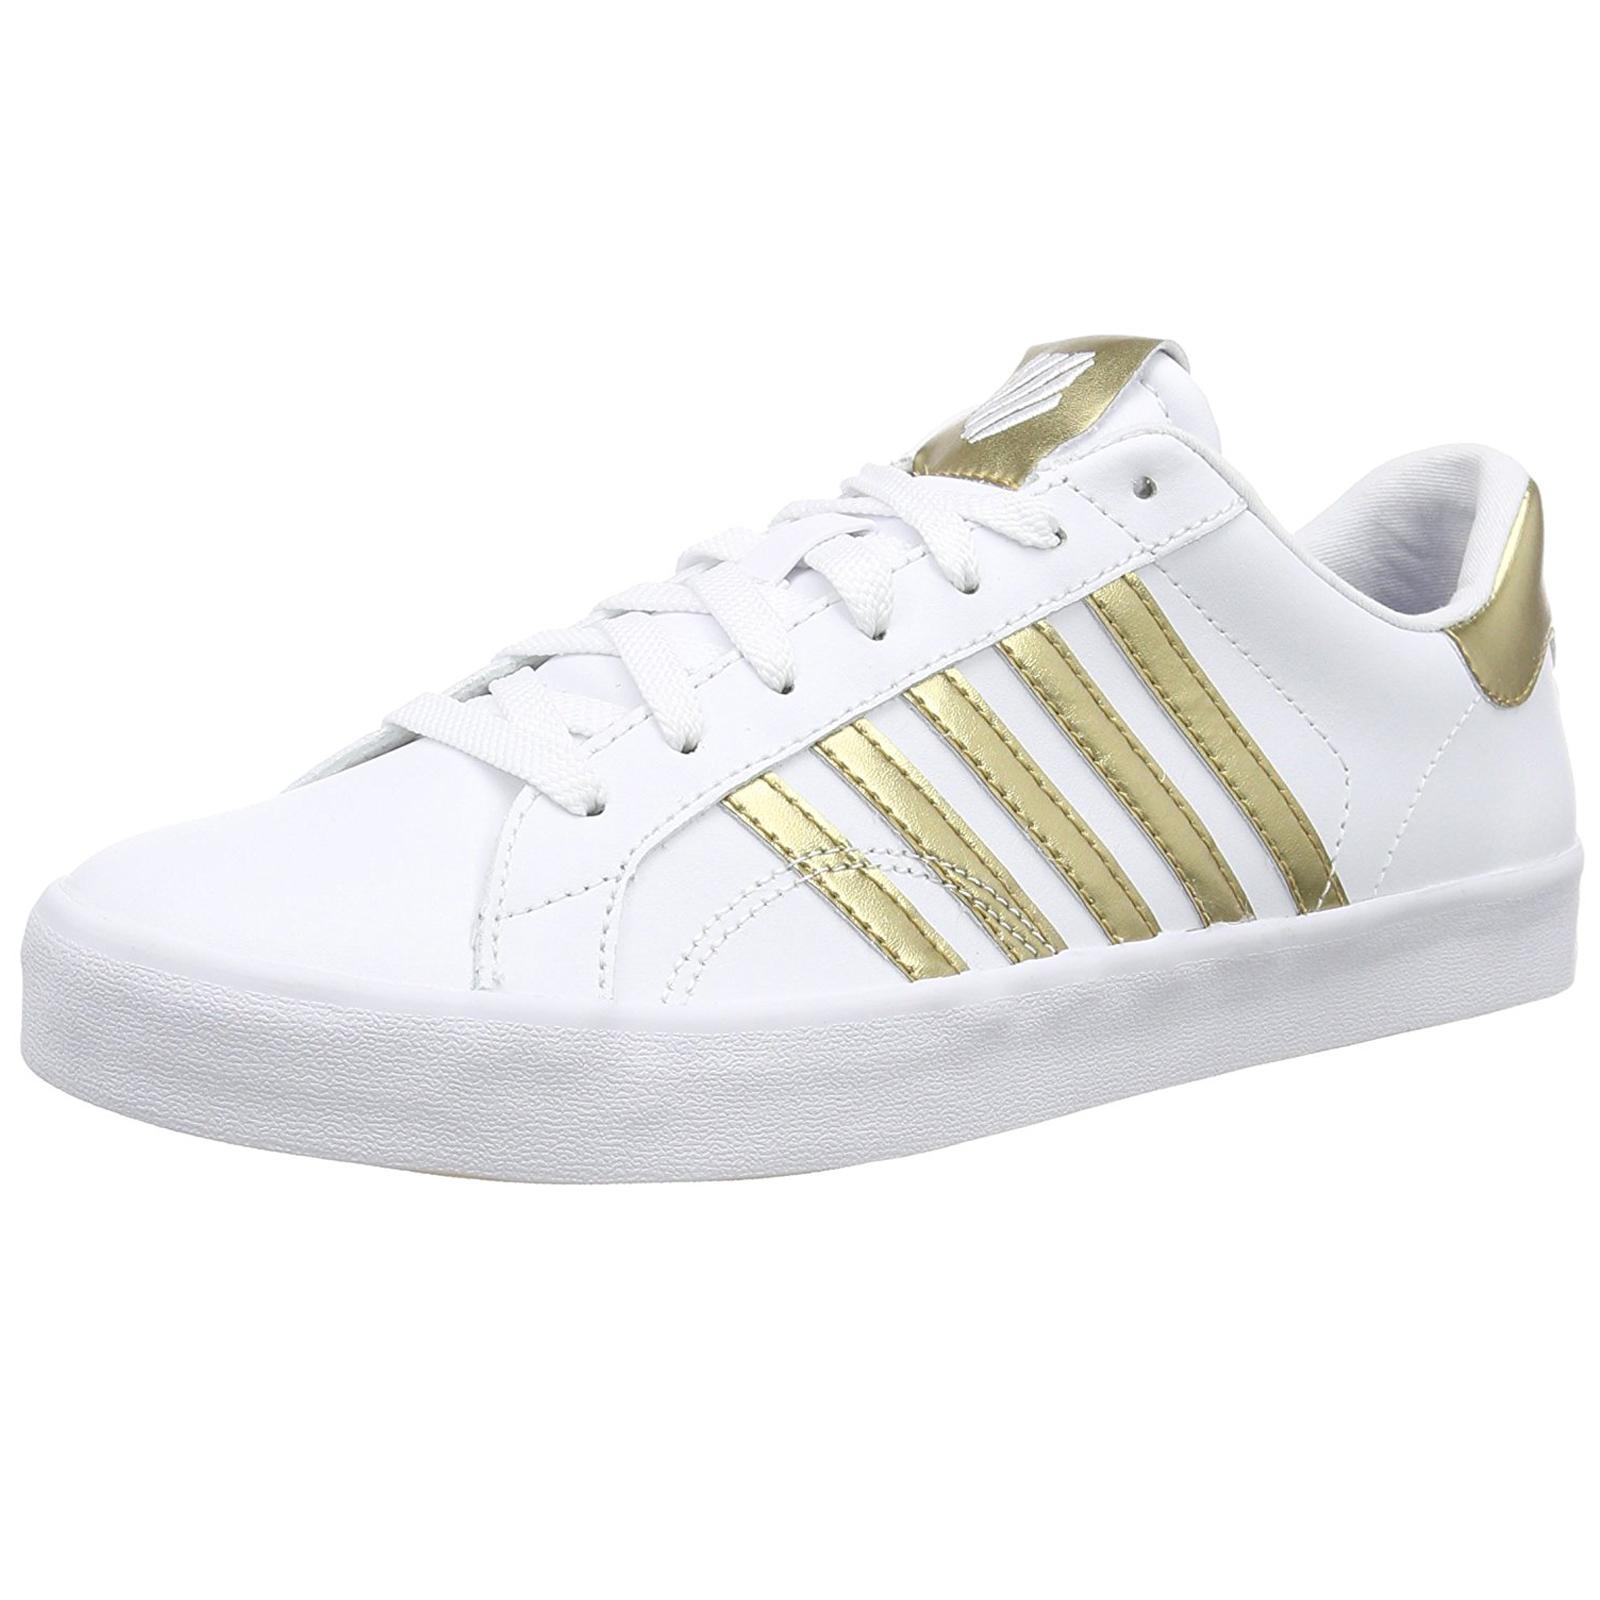 K-Swiss Mujer Belmont SO Designer Sports Trainer Ladies Ladies Trainer Iconic Five Stripe Zapatos f9a4c3